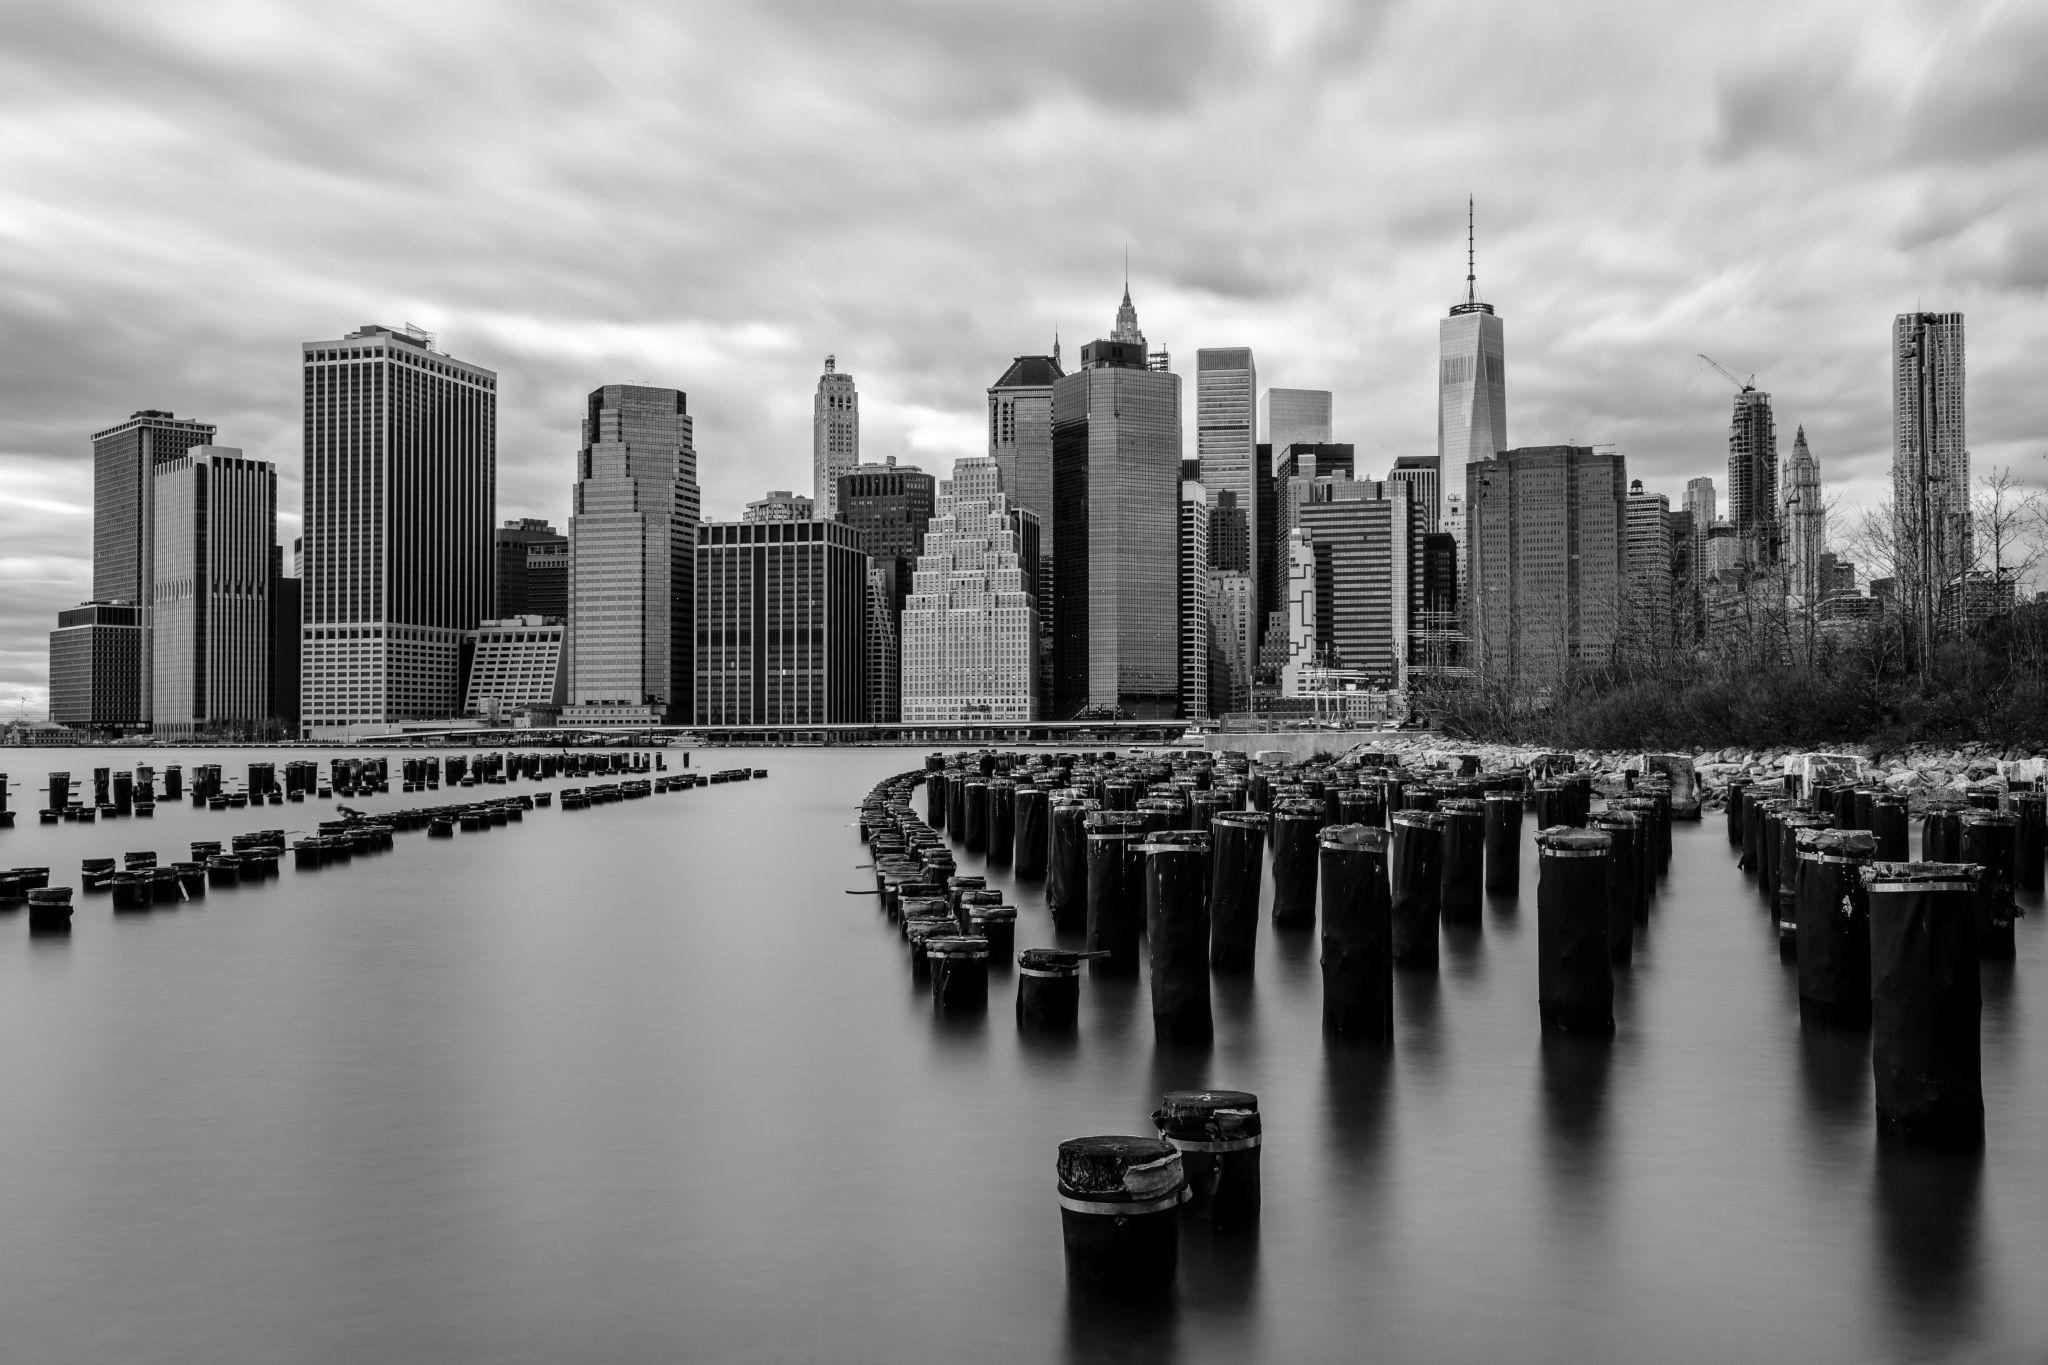 Brooklyn Bridge Park, Brooklyn, NY, USA